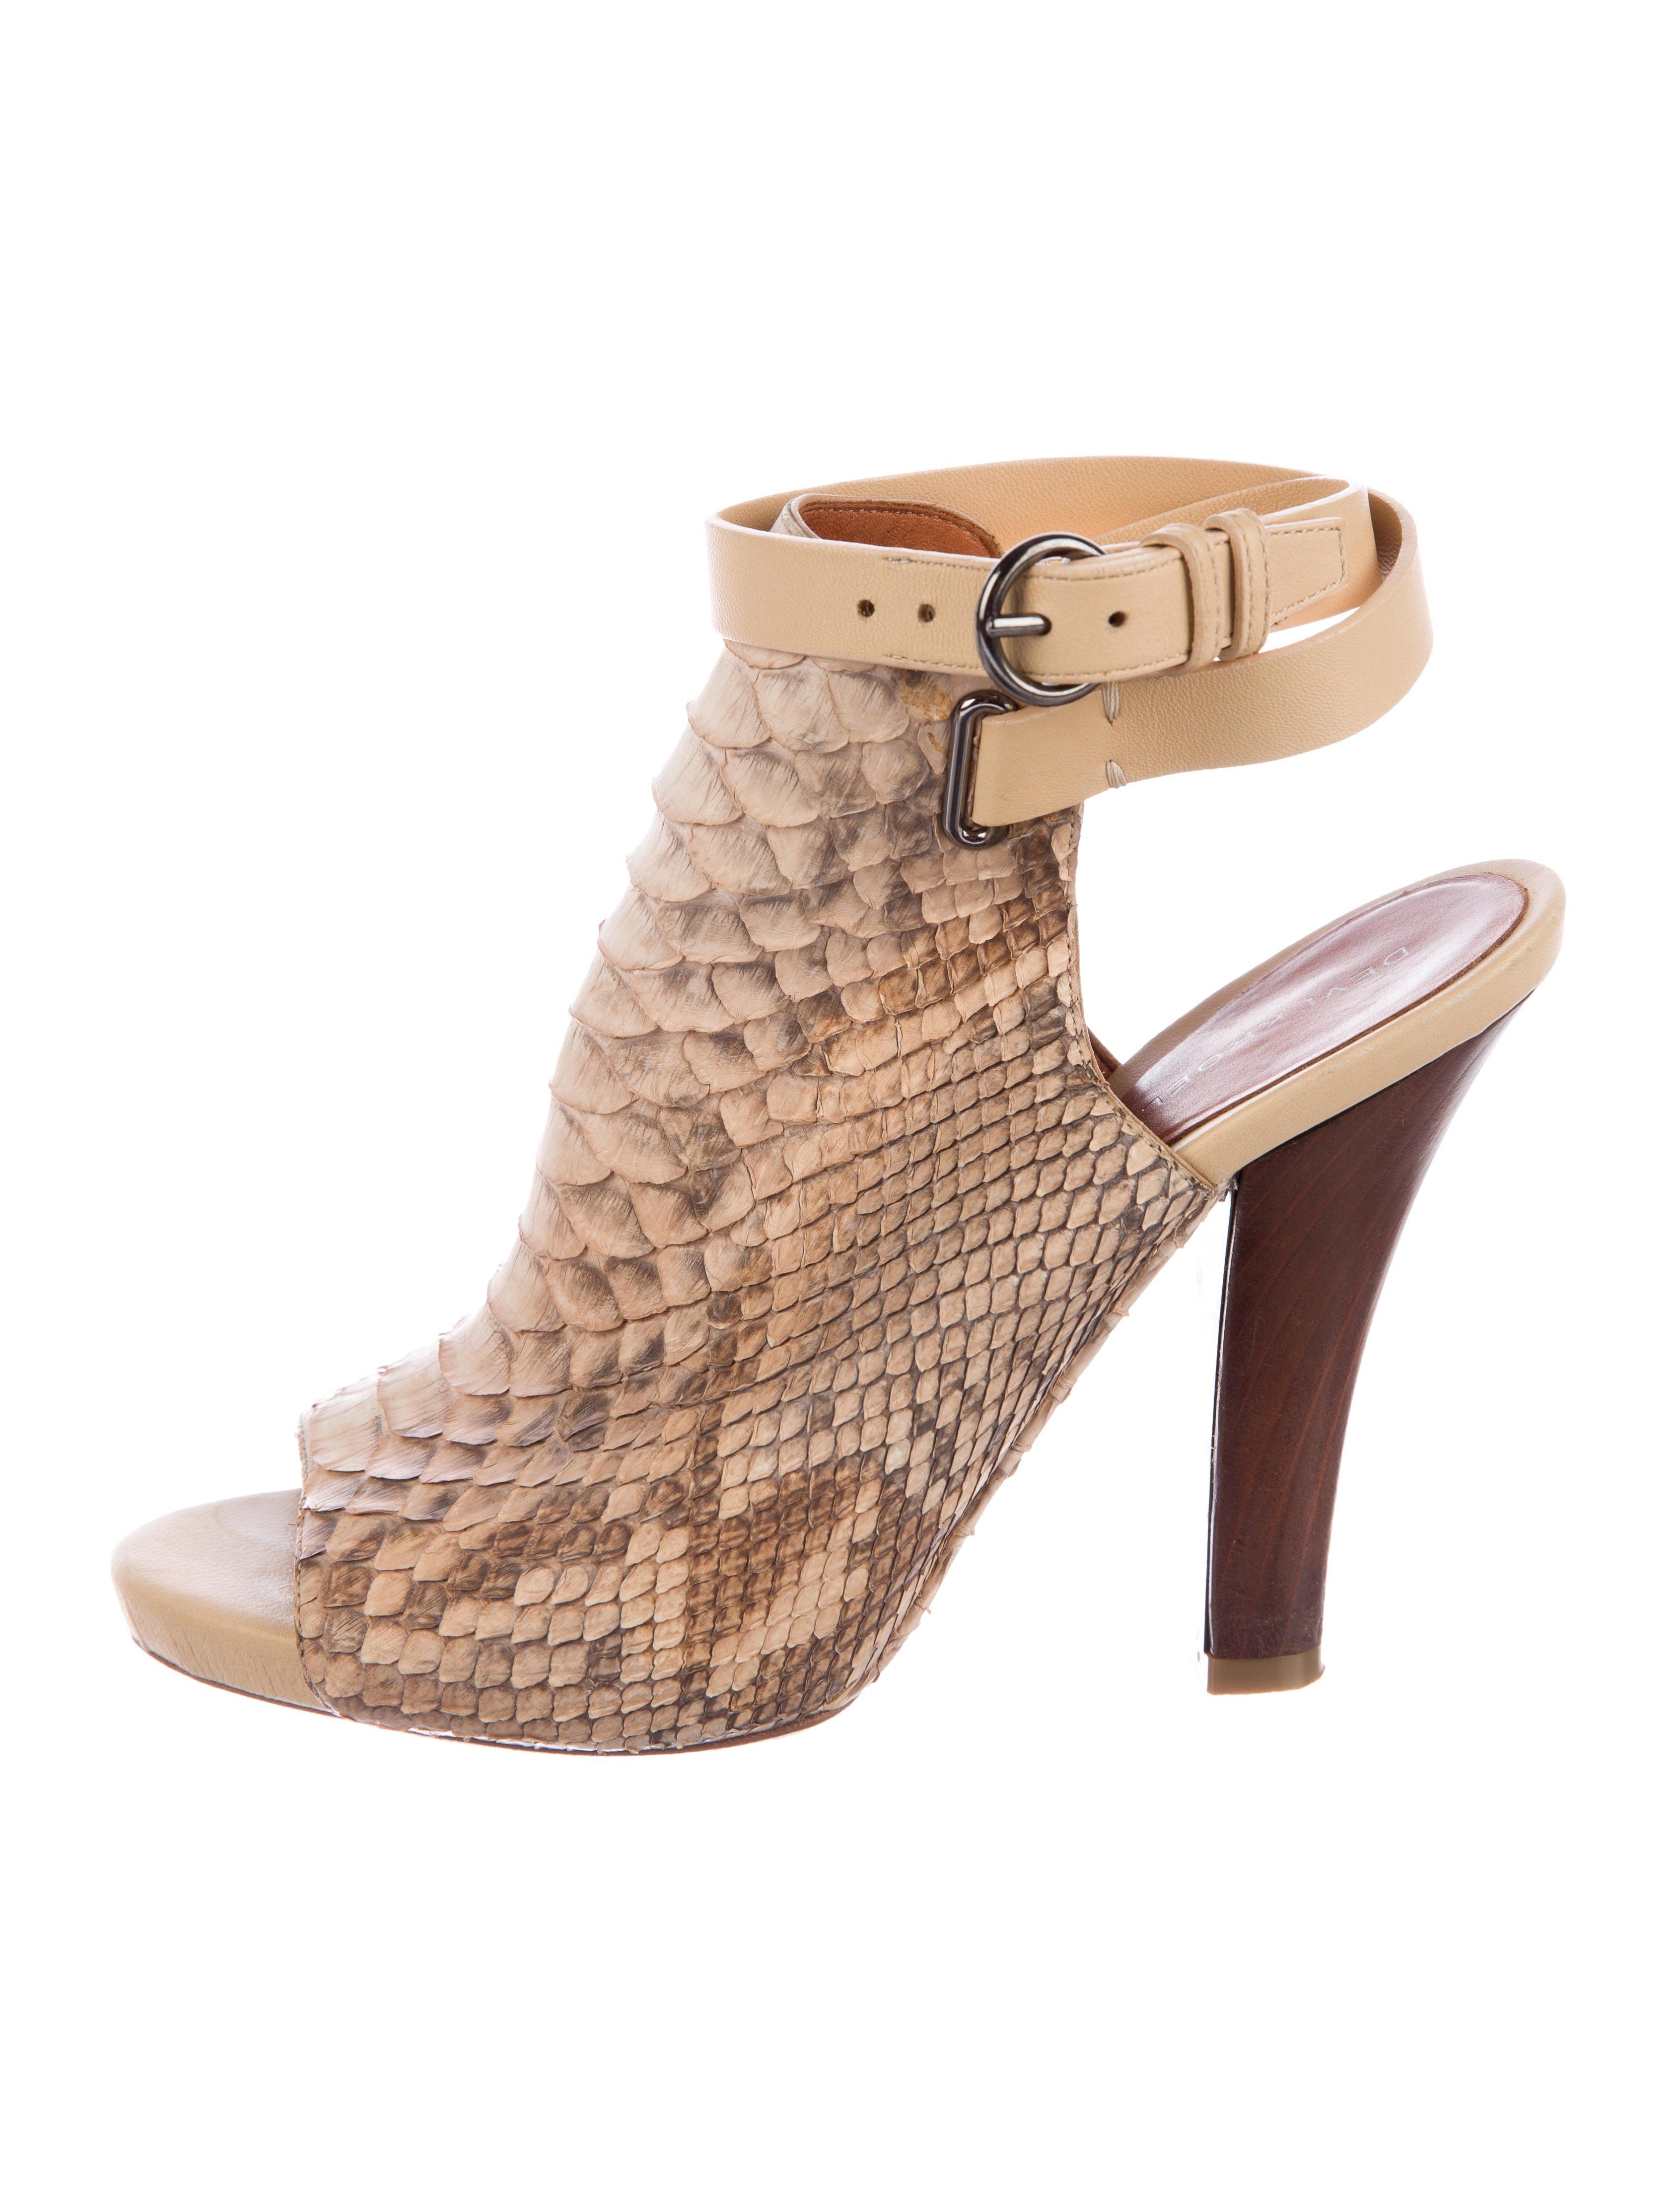 outlet online Devi Kroell Python Glove Sandals best seller sale extremely shopping online outlet sale clearance ebay rKvDd6